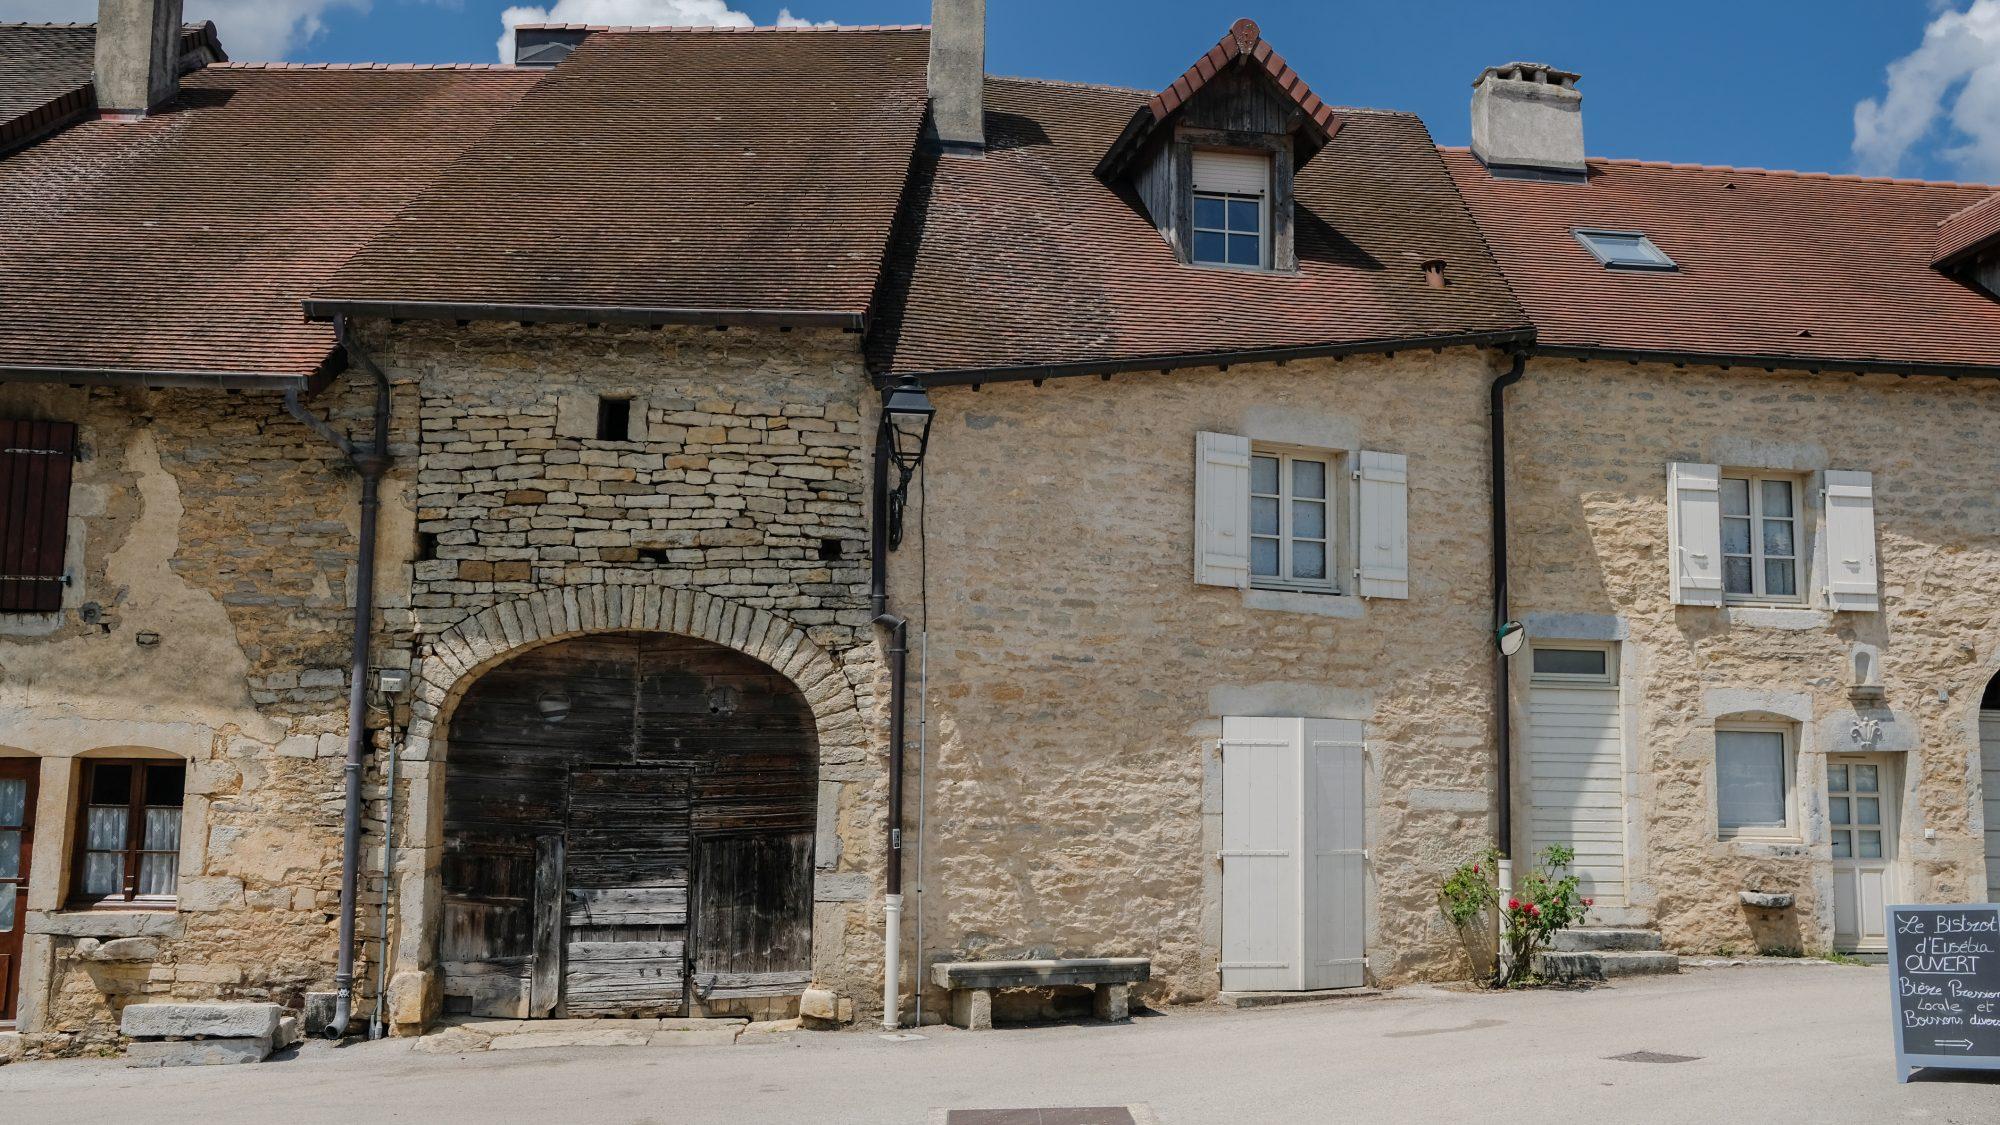 Penchée? - Chateau-Chalon, Jura